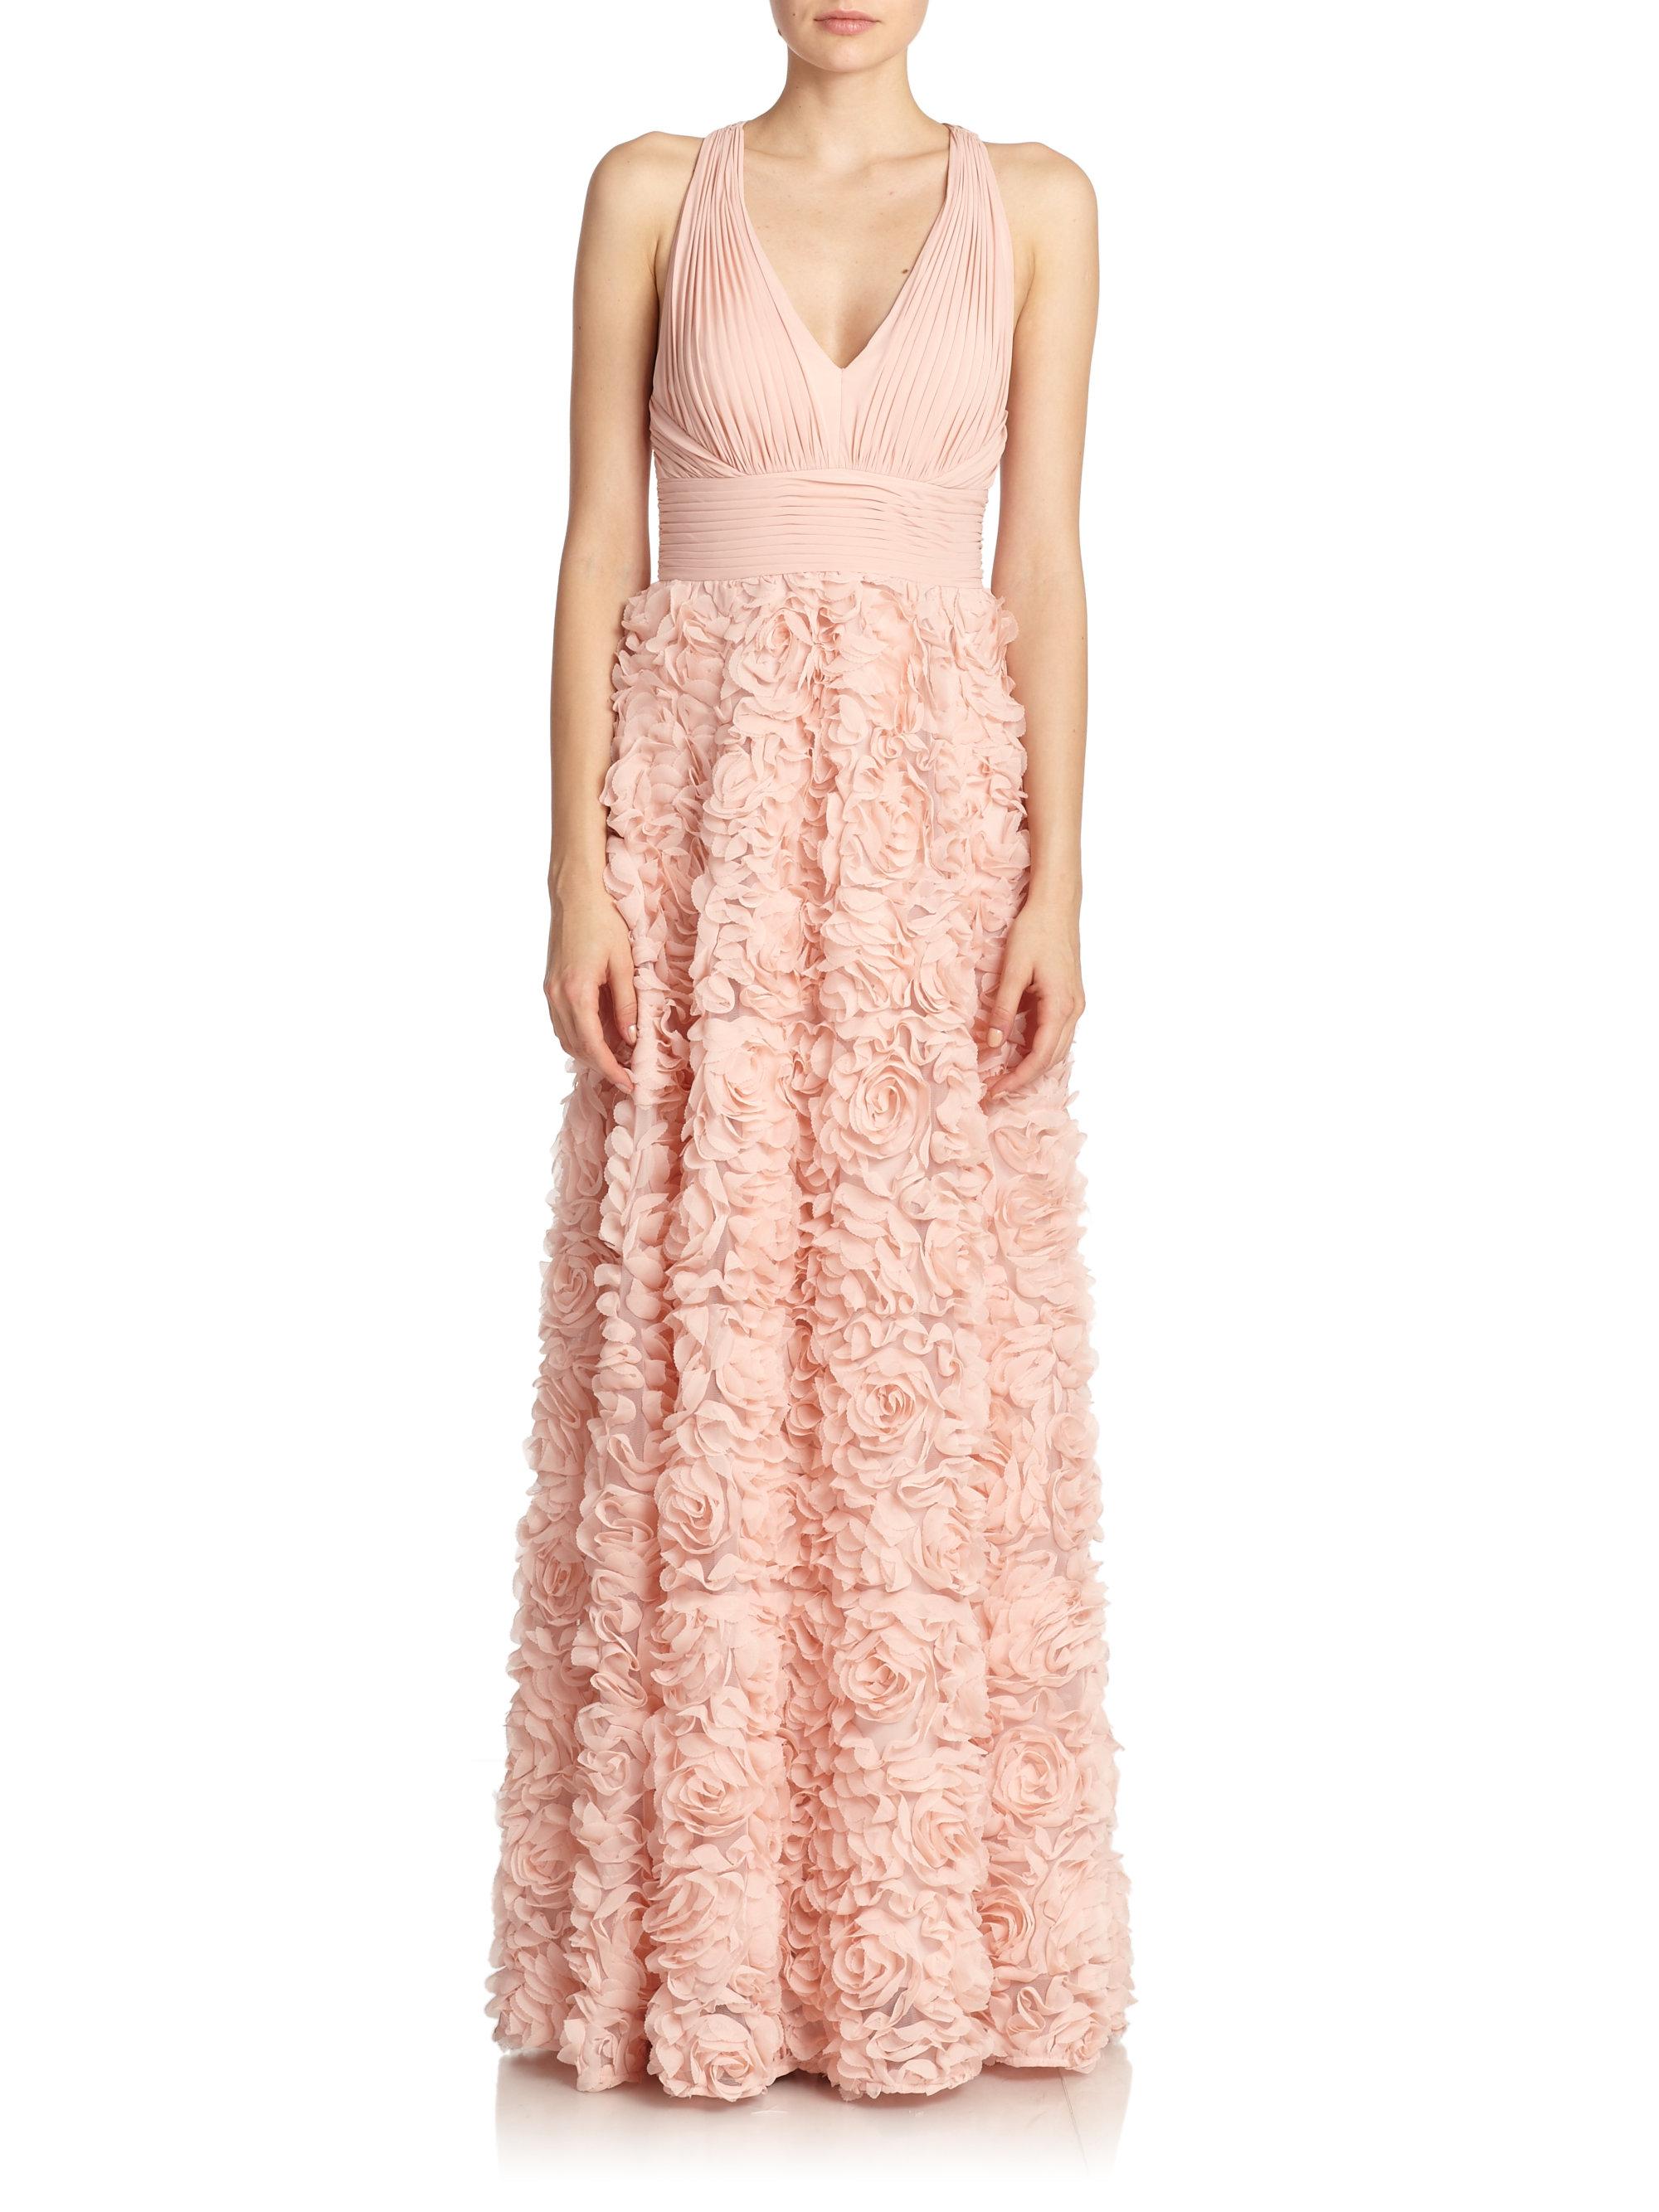 Lyst aidan mattox chiffon flower gown in pink gallery mightylinksfo Images